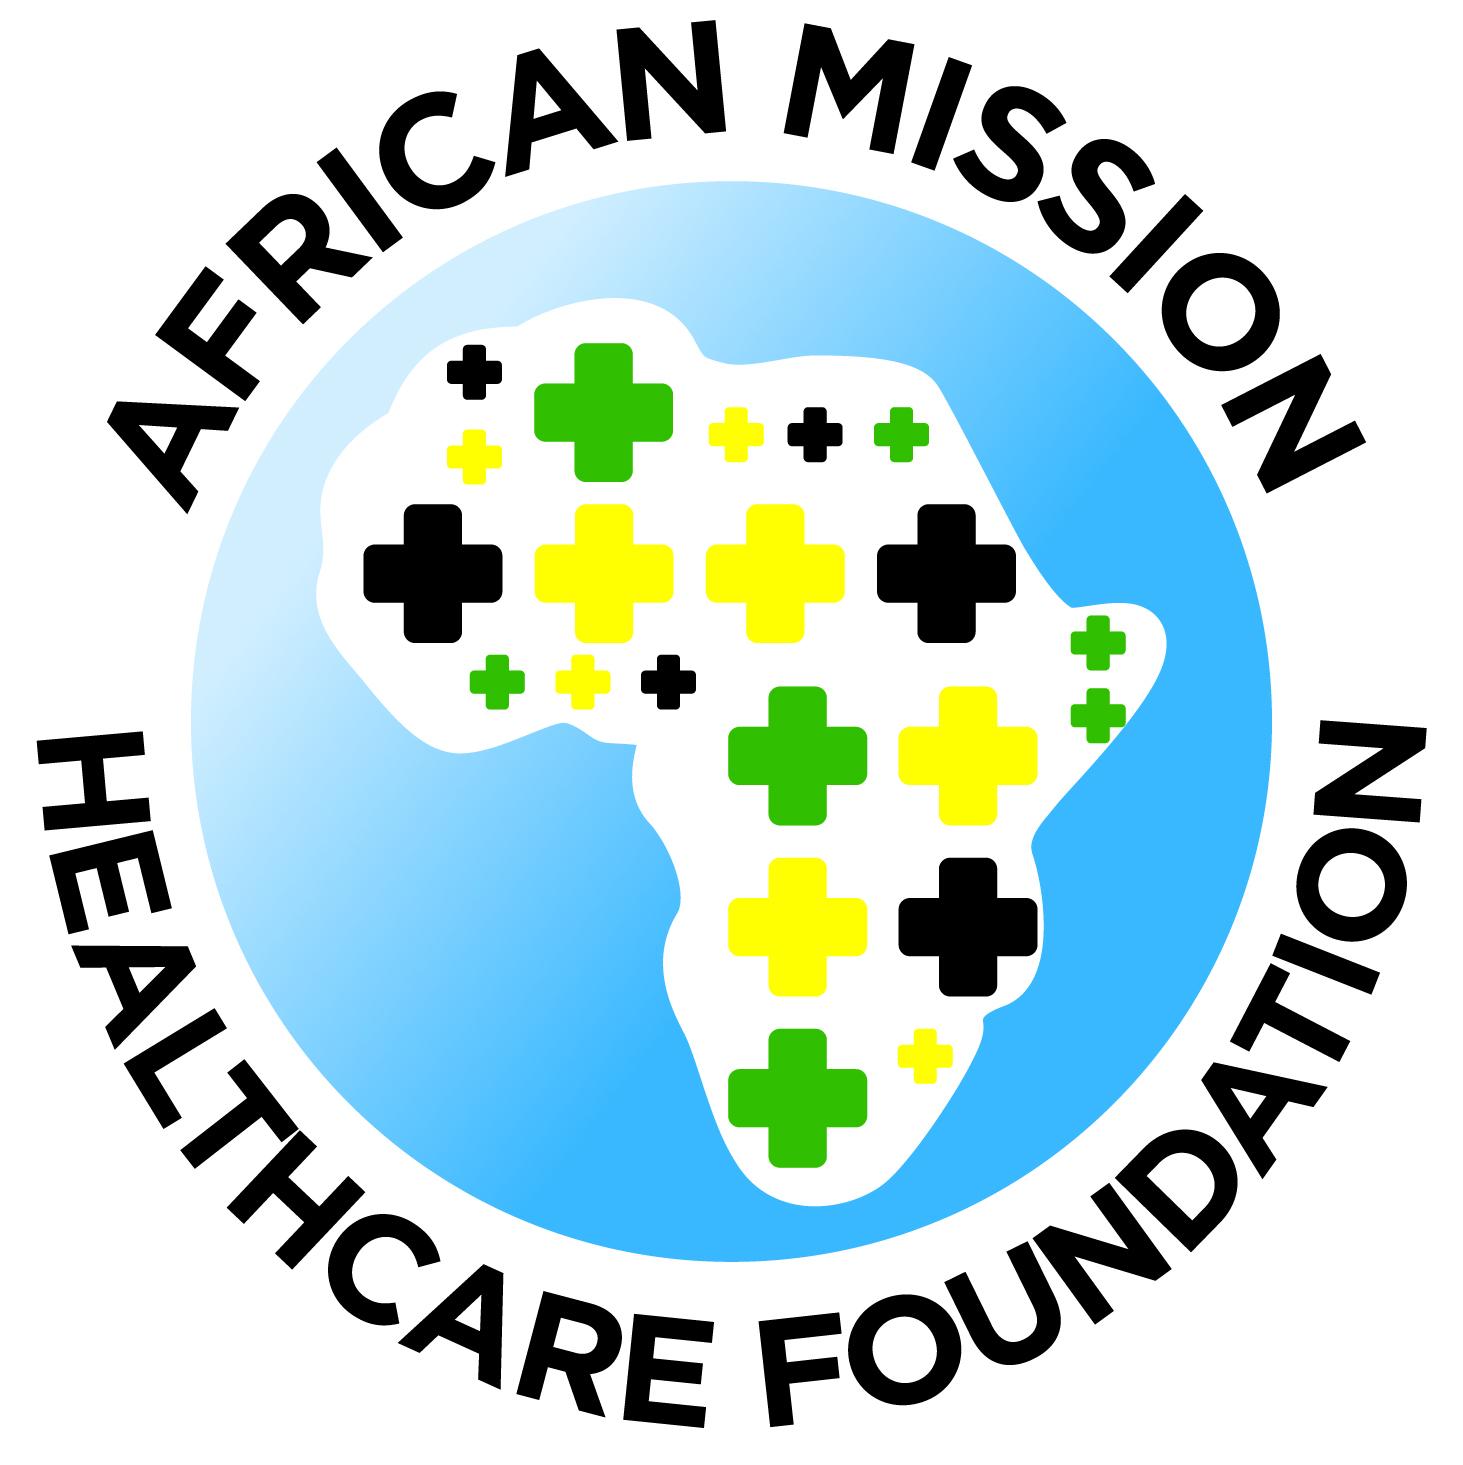 Amhf logo